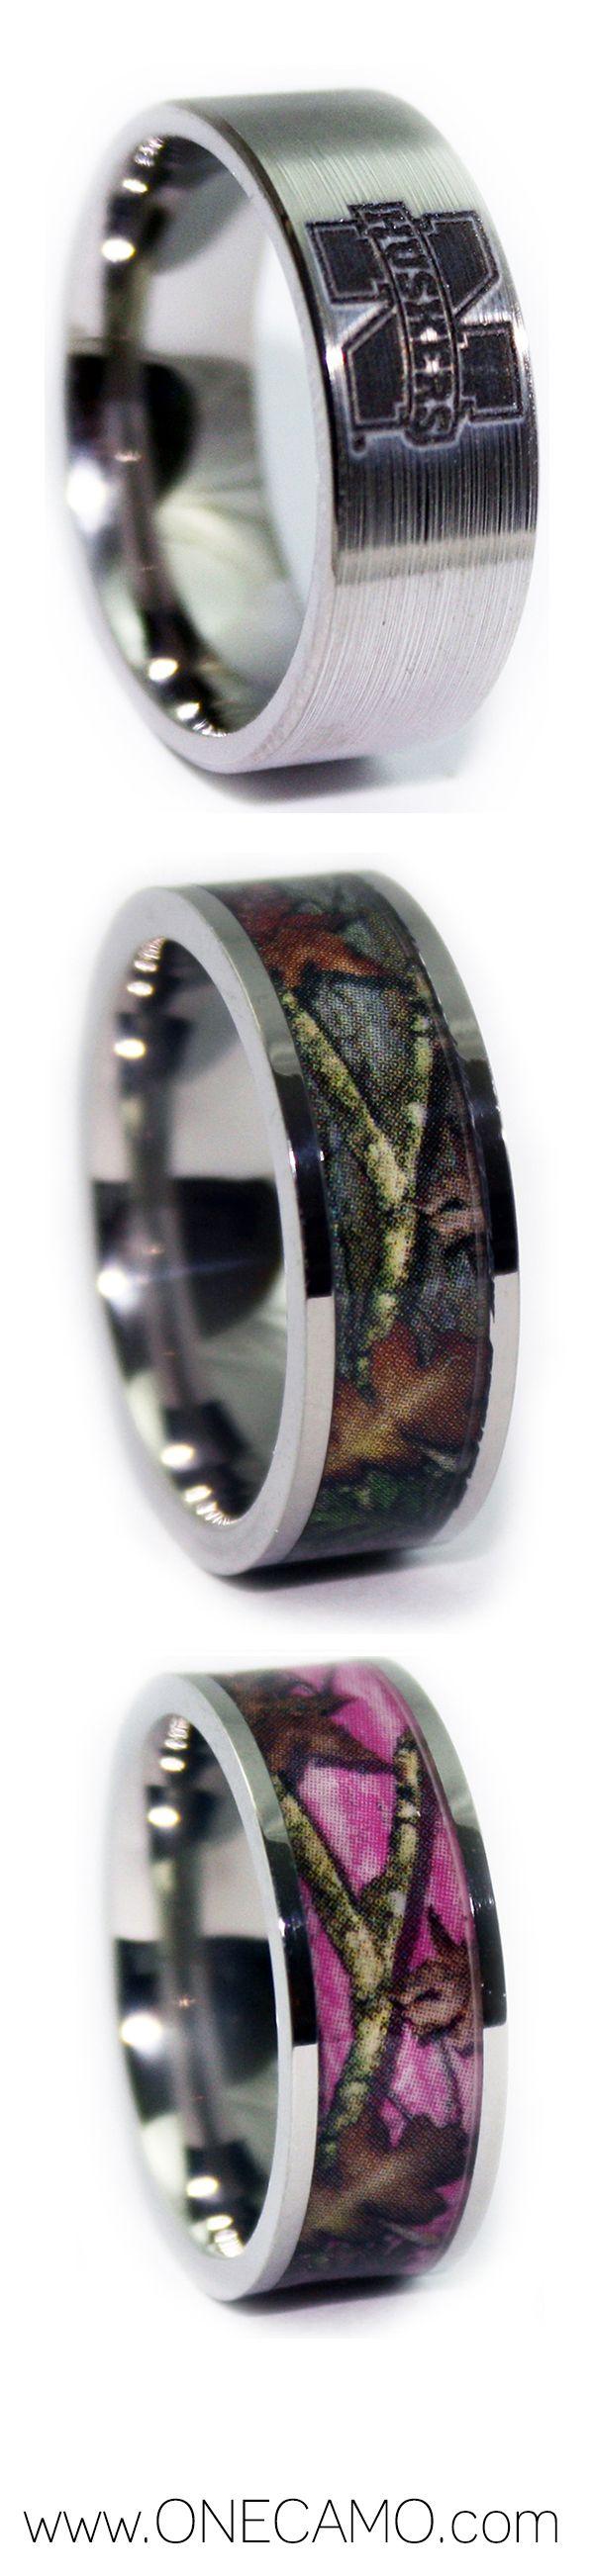 camo engagement rings camouflage wedding ring sets Shop Camo Wedding Rings by ONE CAMO Camo Wedding 1Camo com